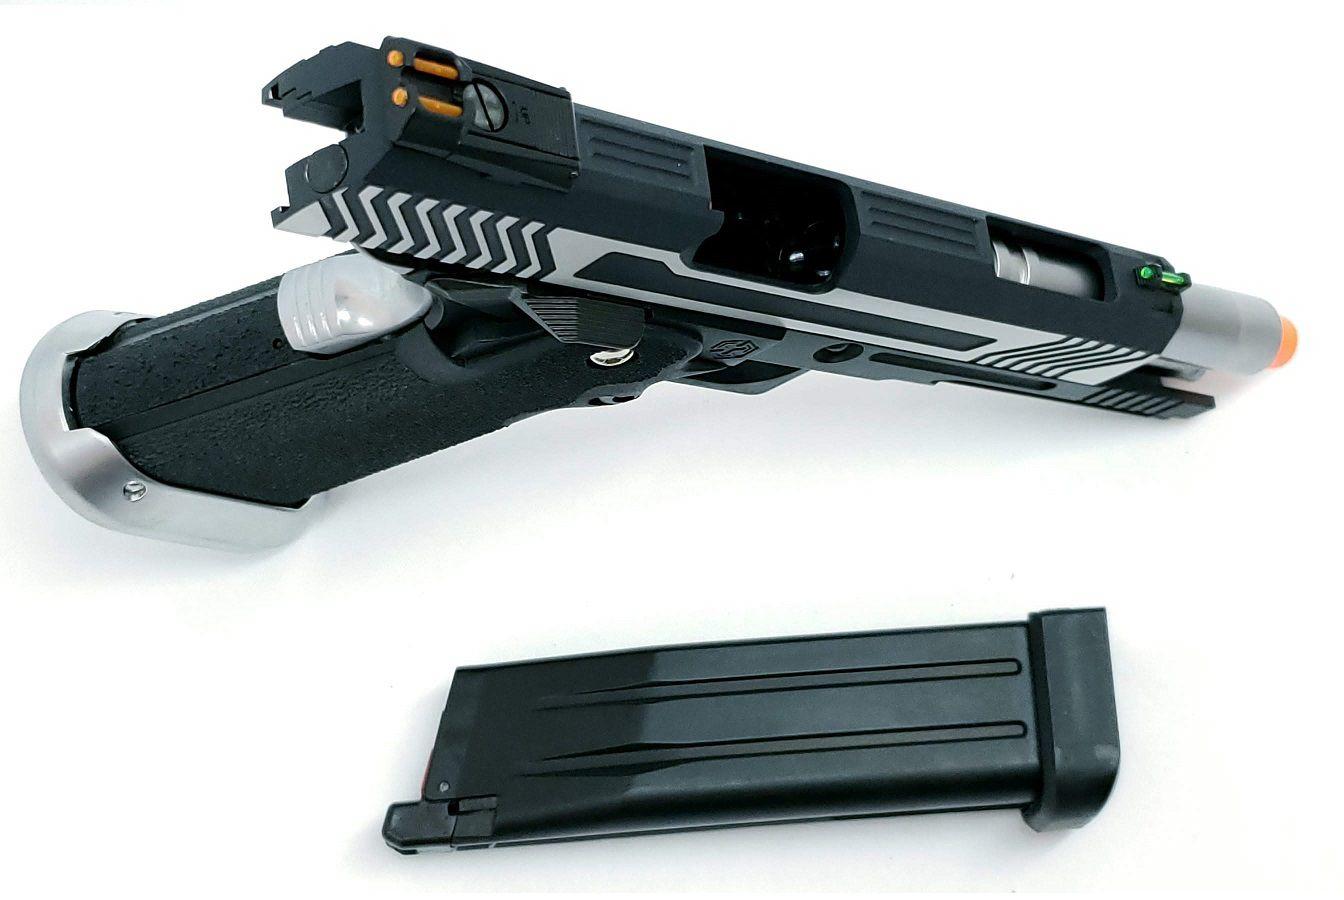 Pistola Airsoft Armorer Works Hicapa HX1101